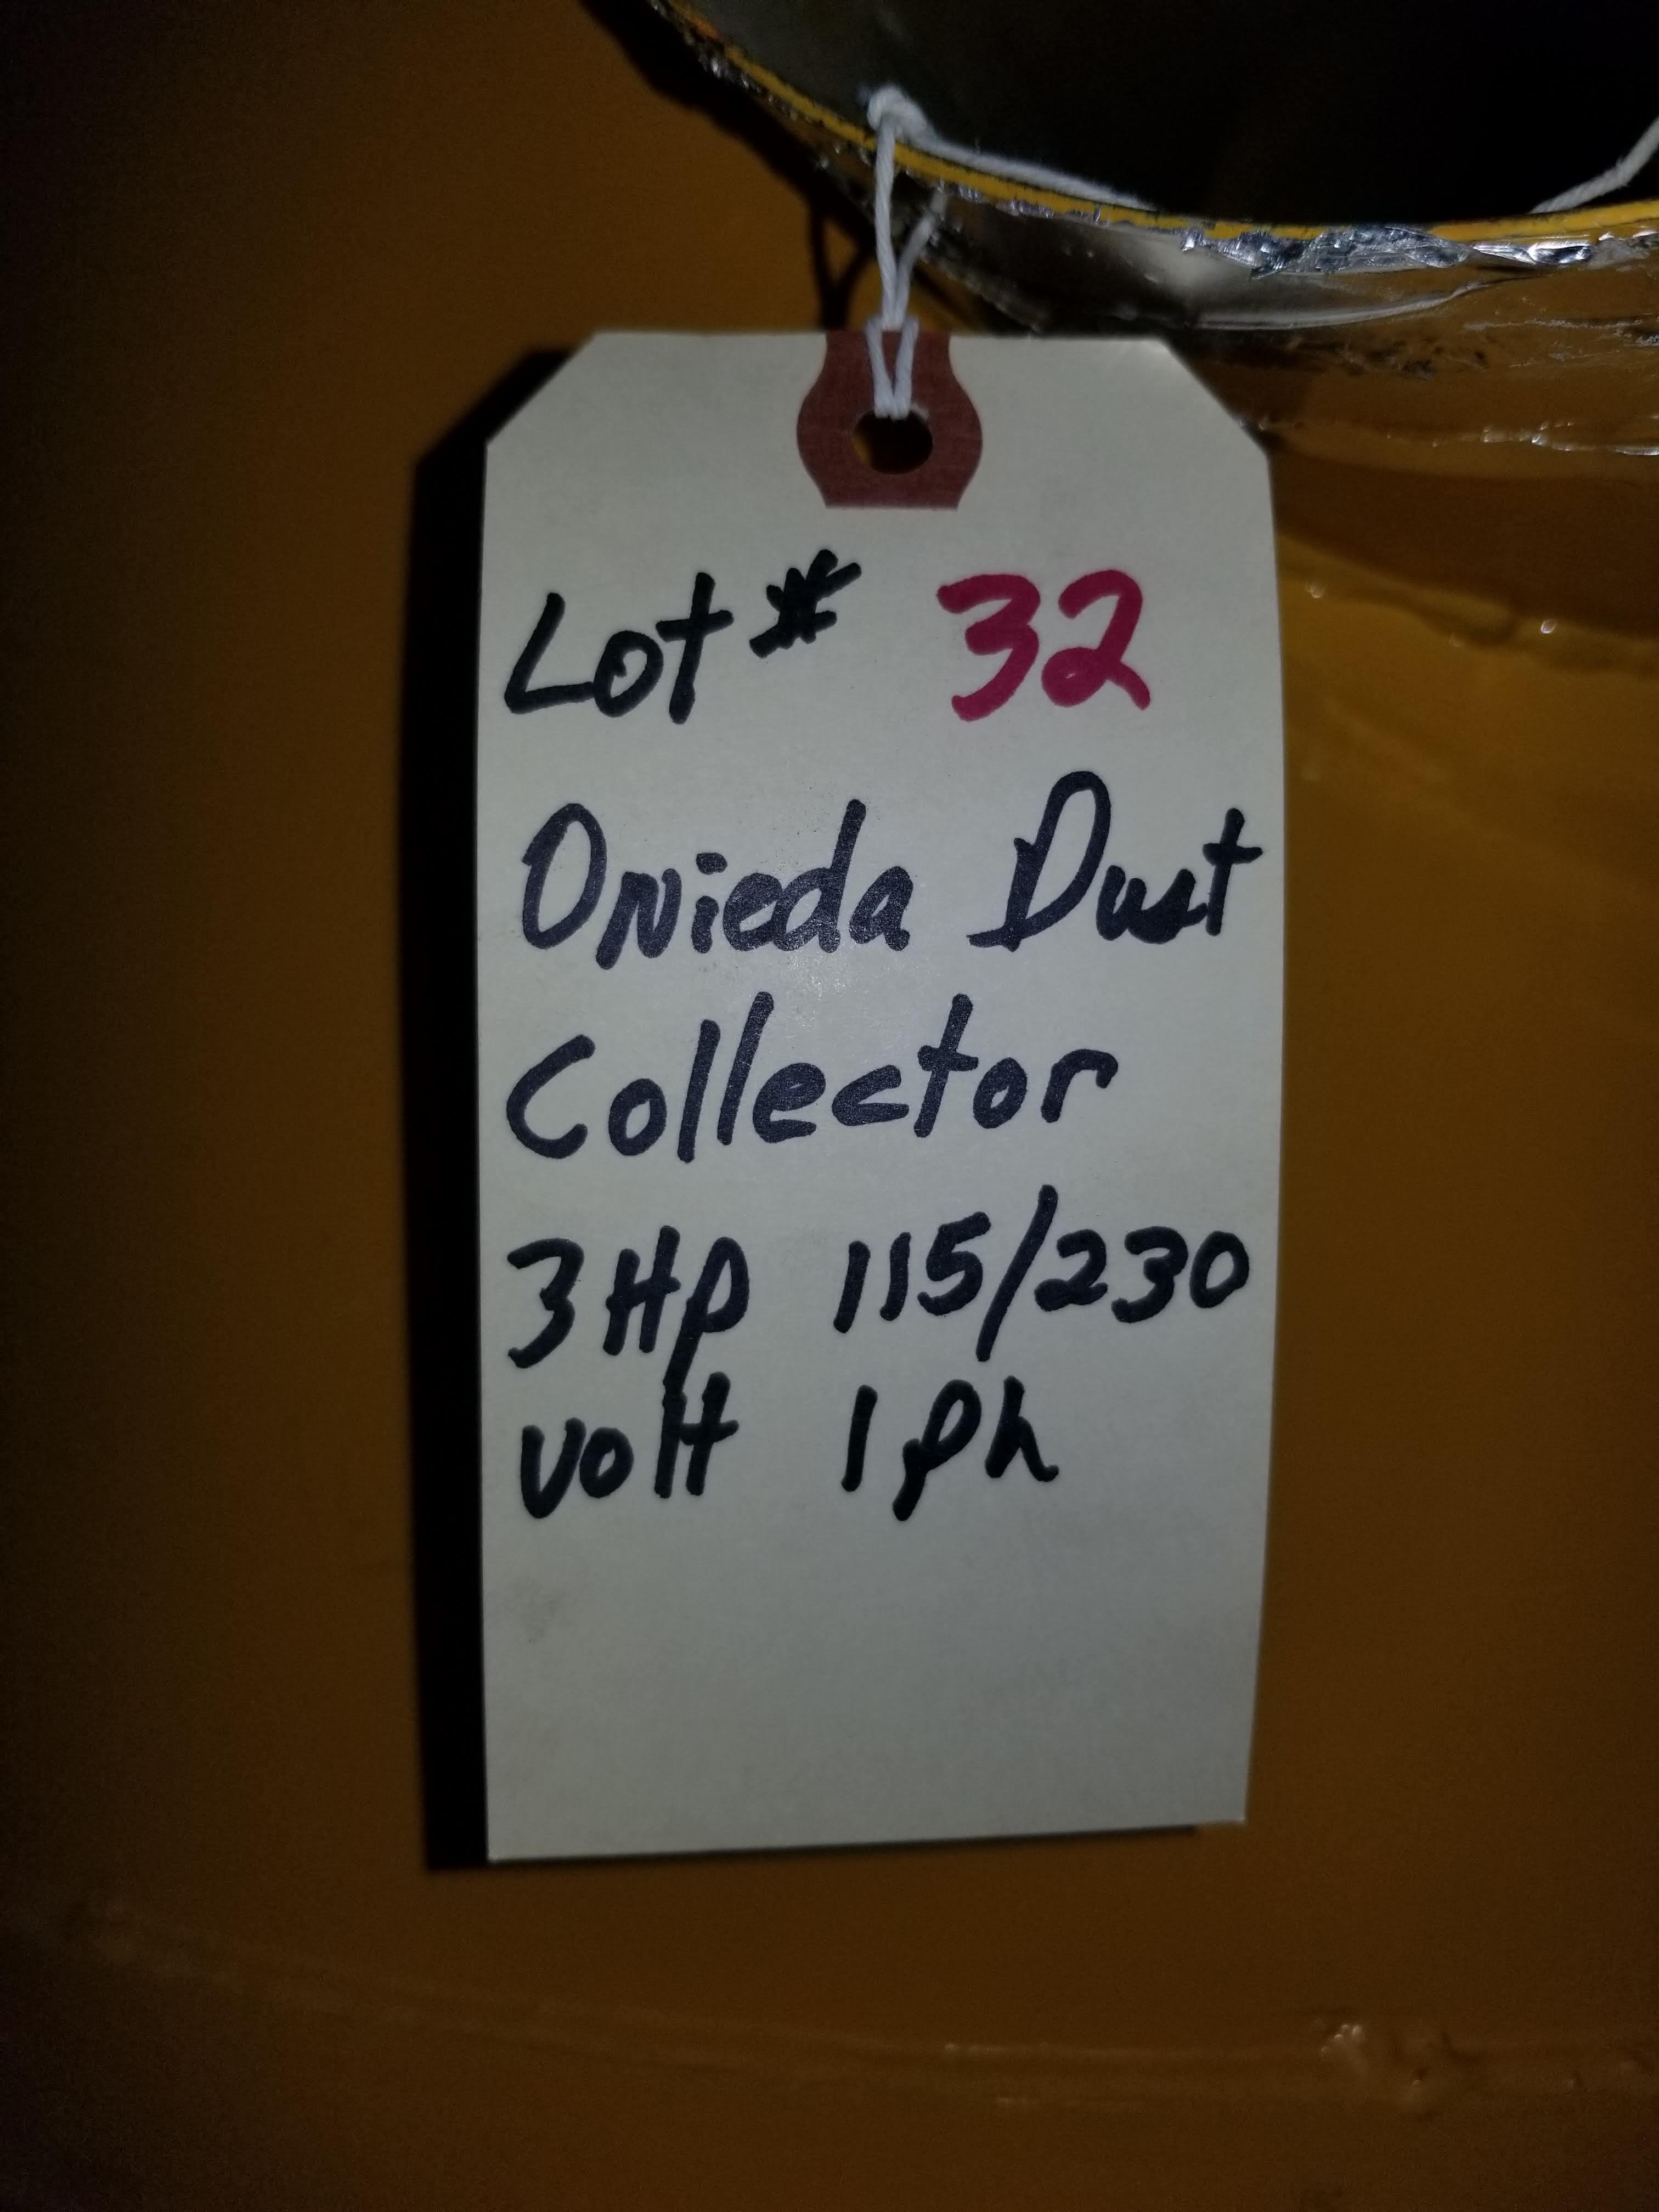 Oneida Dust Collector 3hp Super Dust Gorilla, 3hp 1ph 115/230V - Image 7 of 7